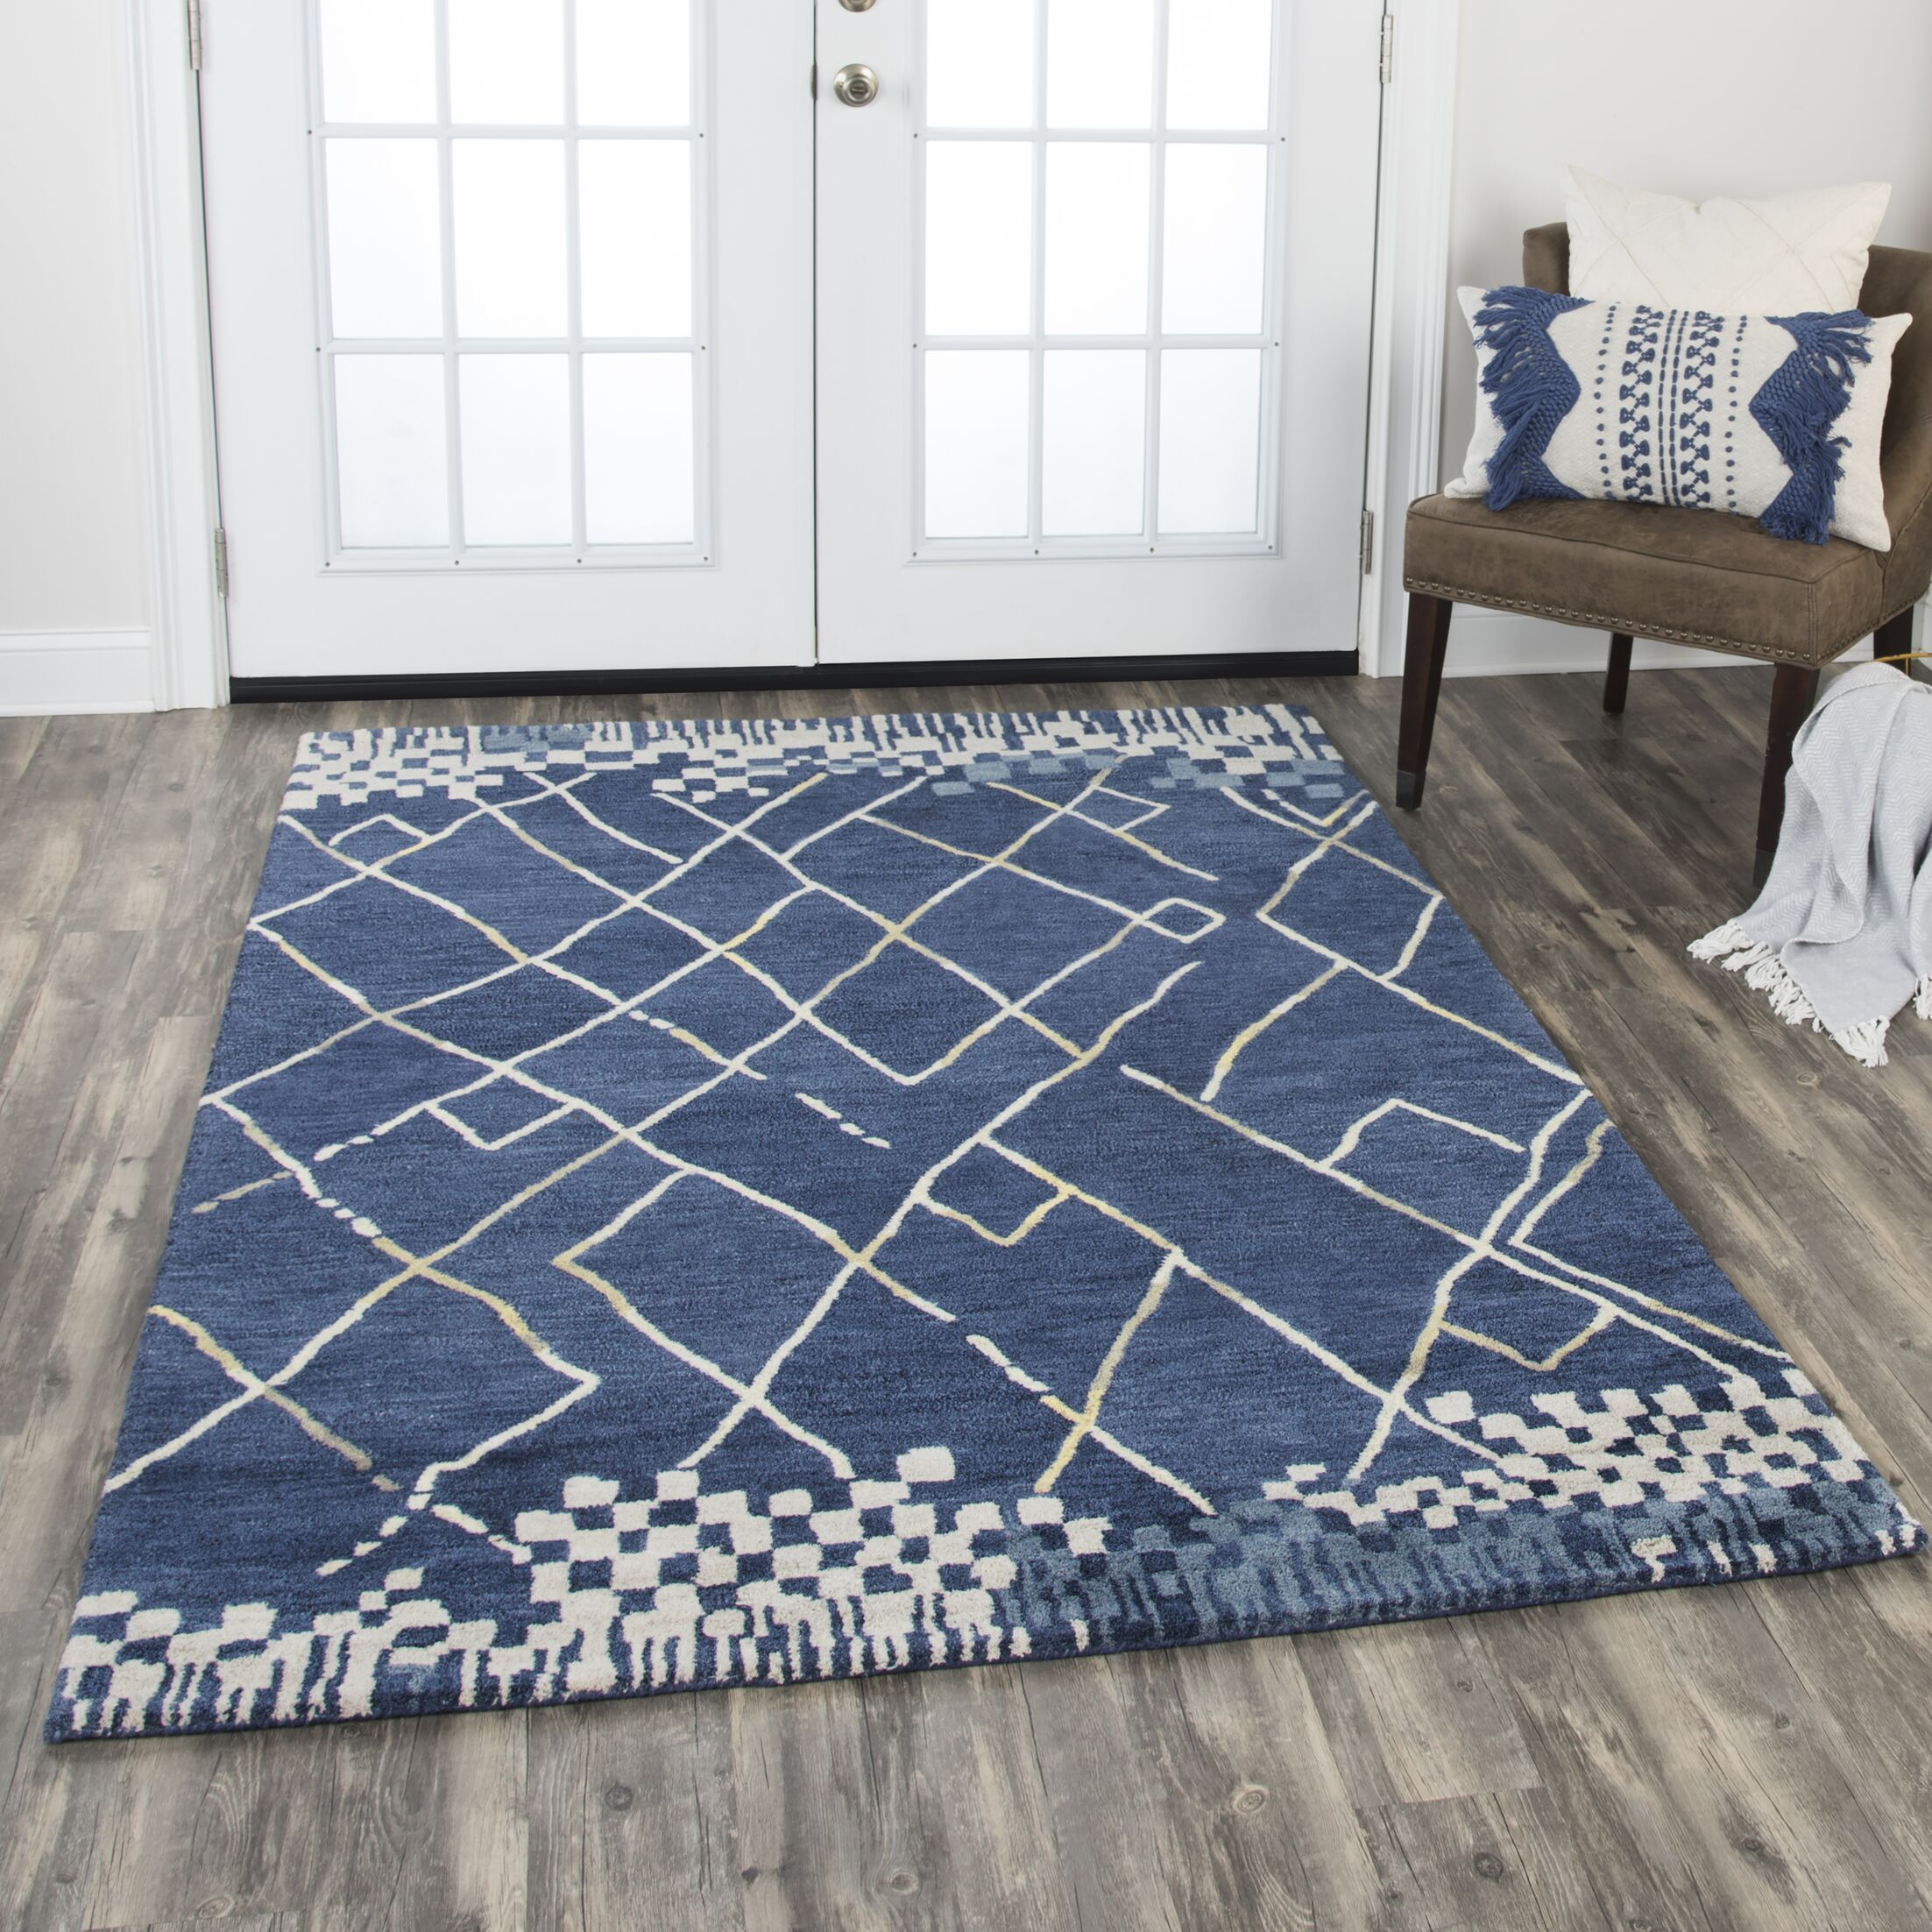 Hargis Hand-Tufted Wool Navy Area Rug Rug Size: Rectangle 8' x 10'